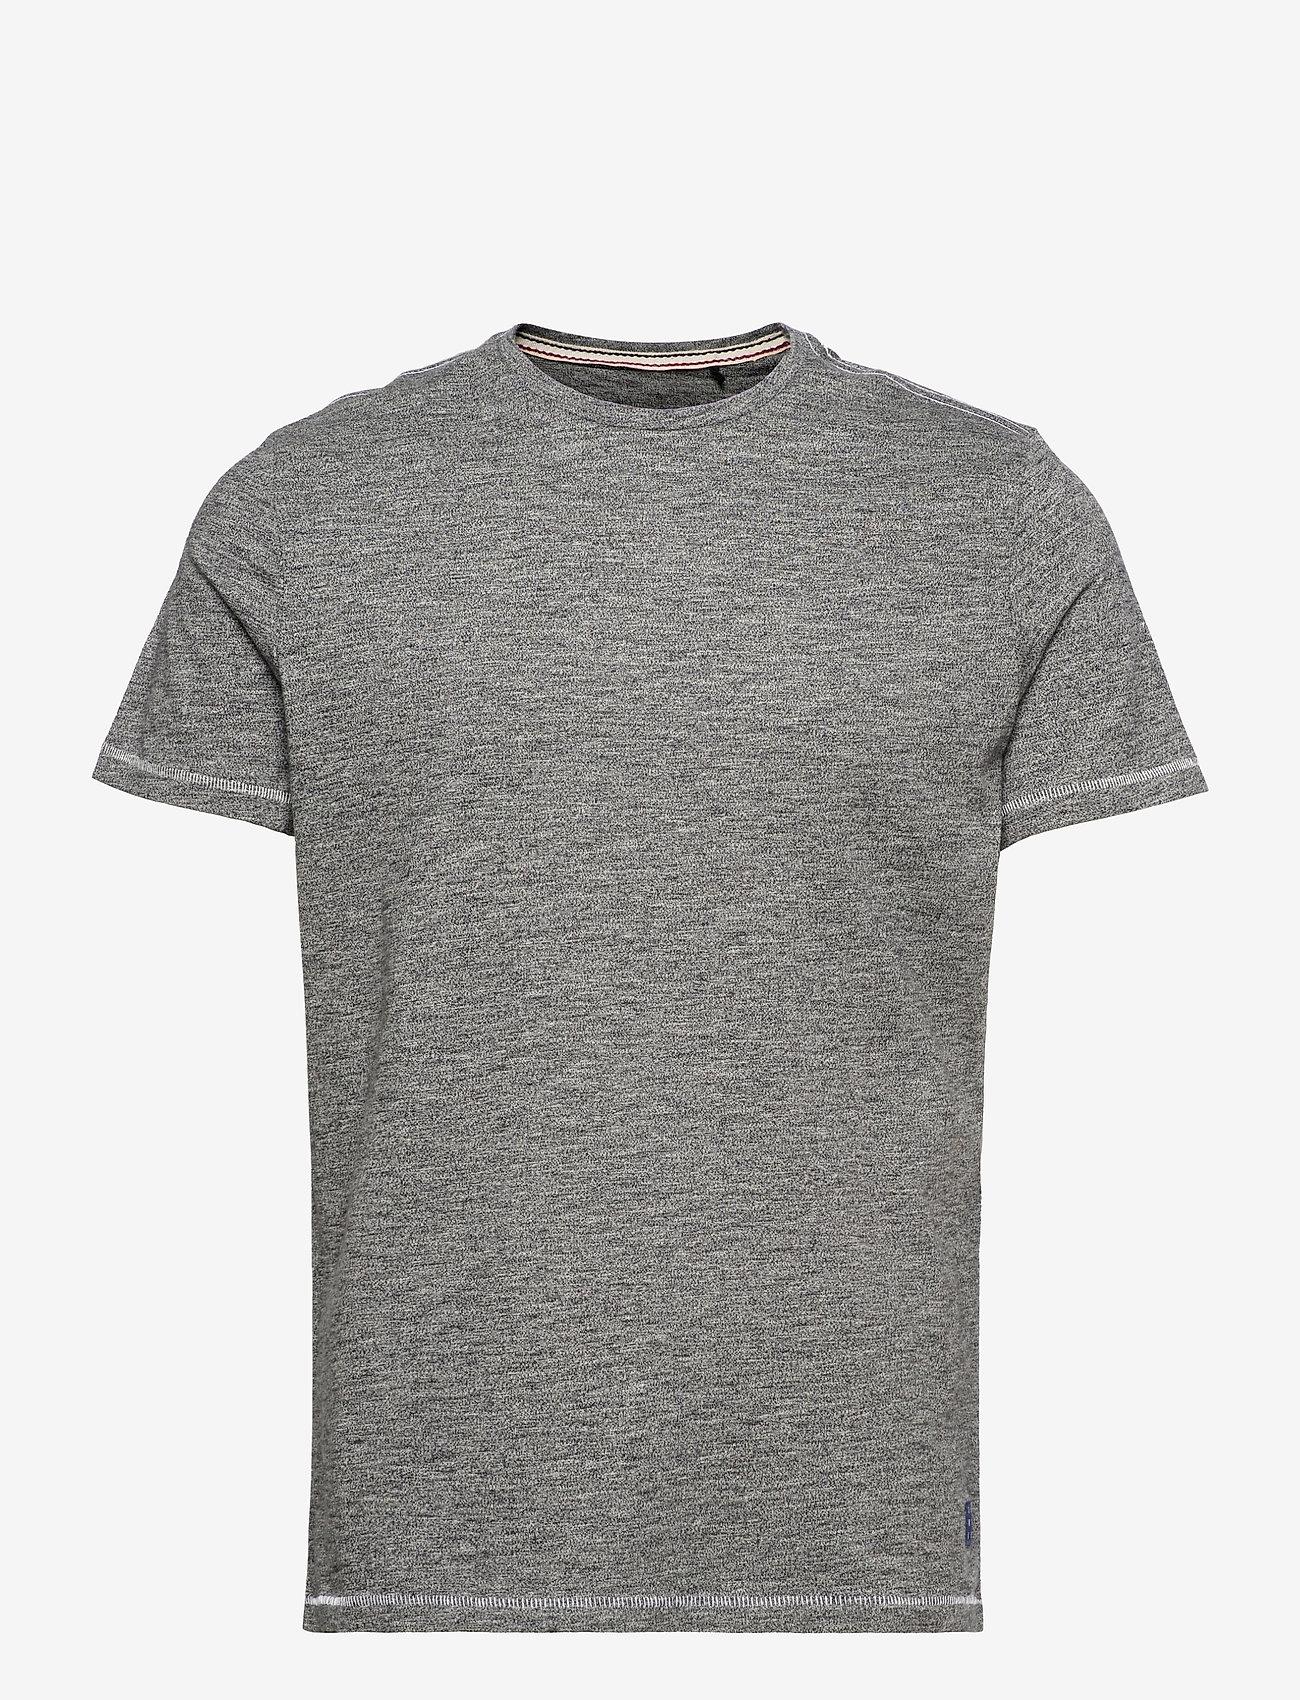 Blend - Tee - basic t-shirts - black - 0